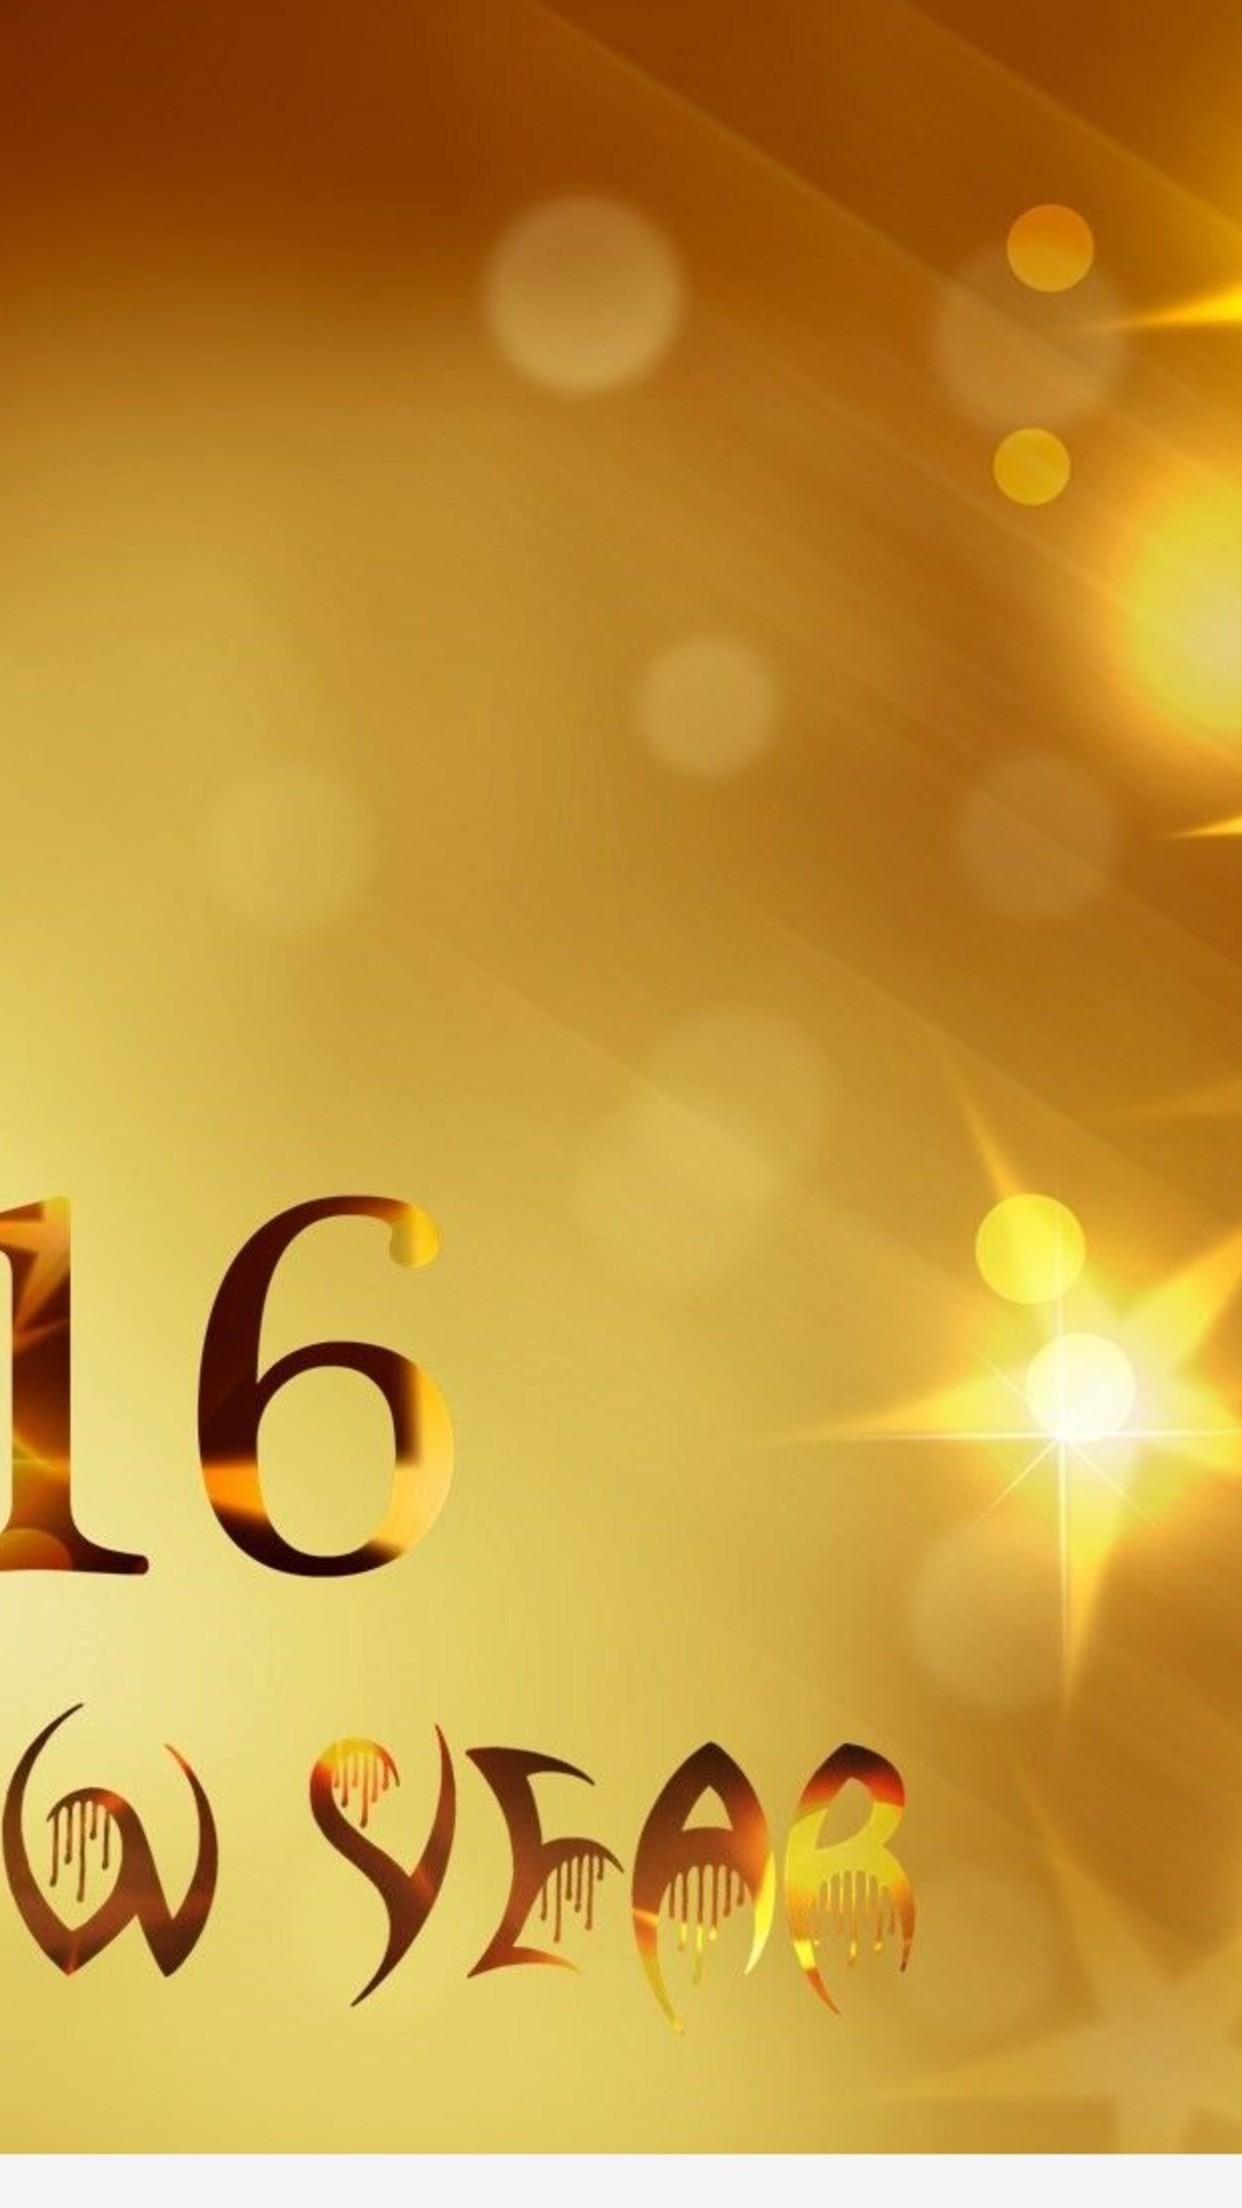 Download Wallpaper 1242x2208 Golden year 2016   Happy New Year 1242x2208